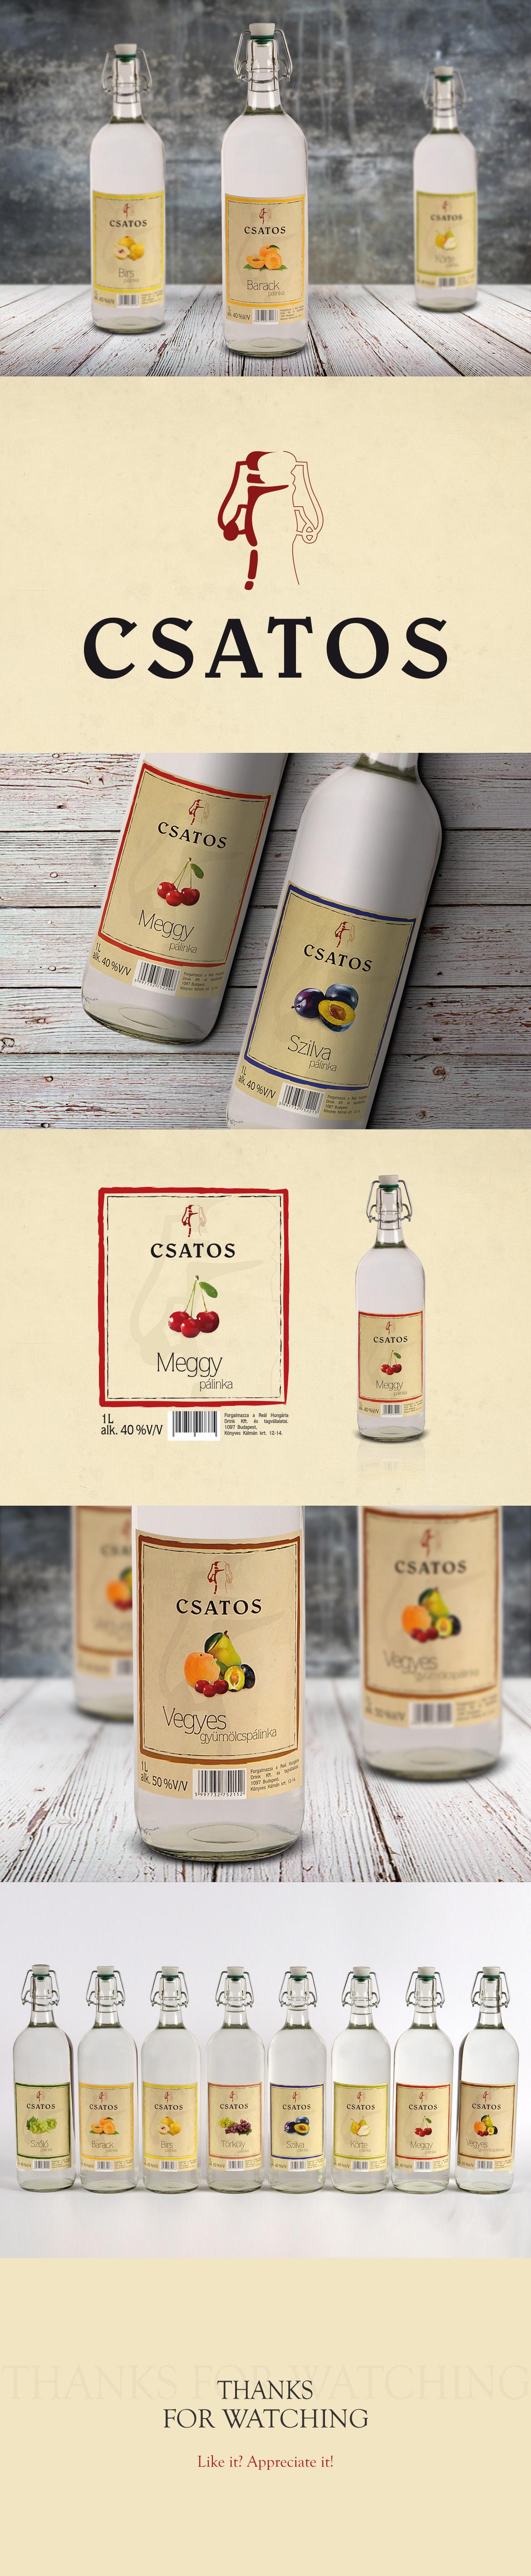 label design palinka label brand identity vector graphic graphic design  product design  beverage bottle ILLUSTRATION